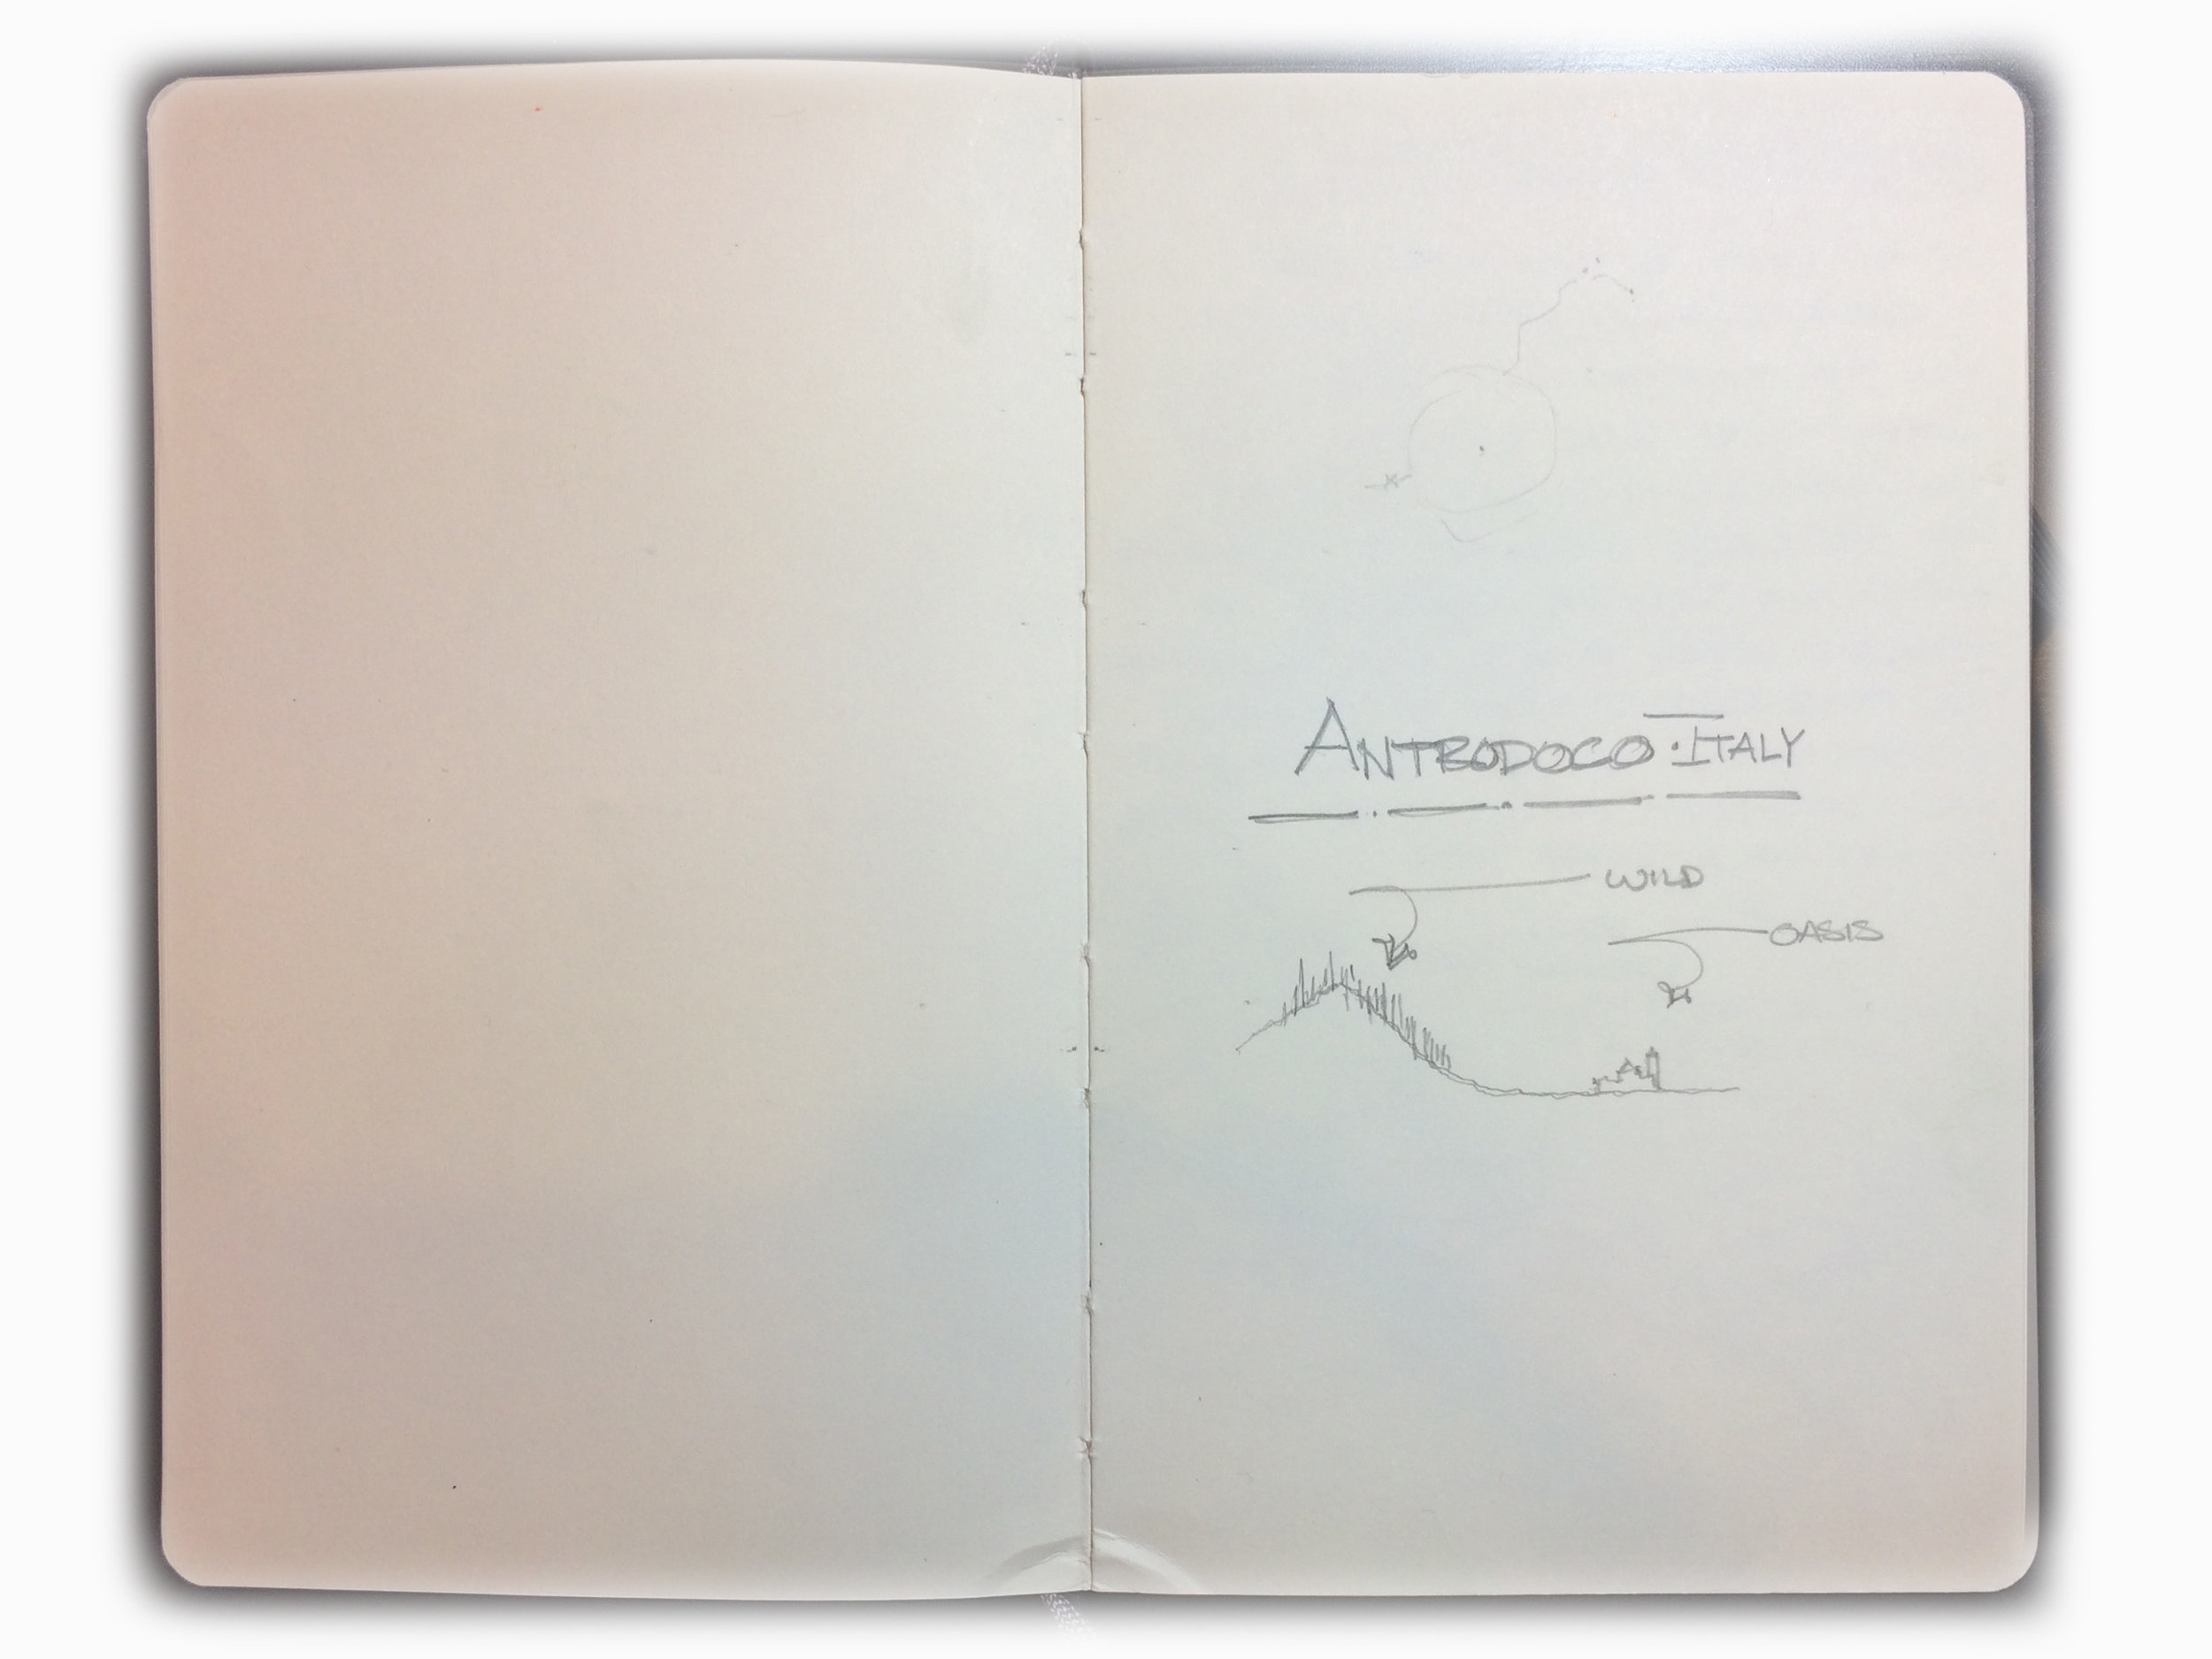 Antrodoco 1.jpg